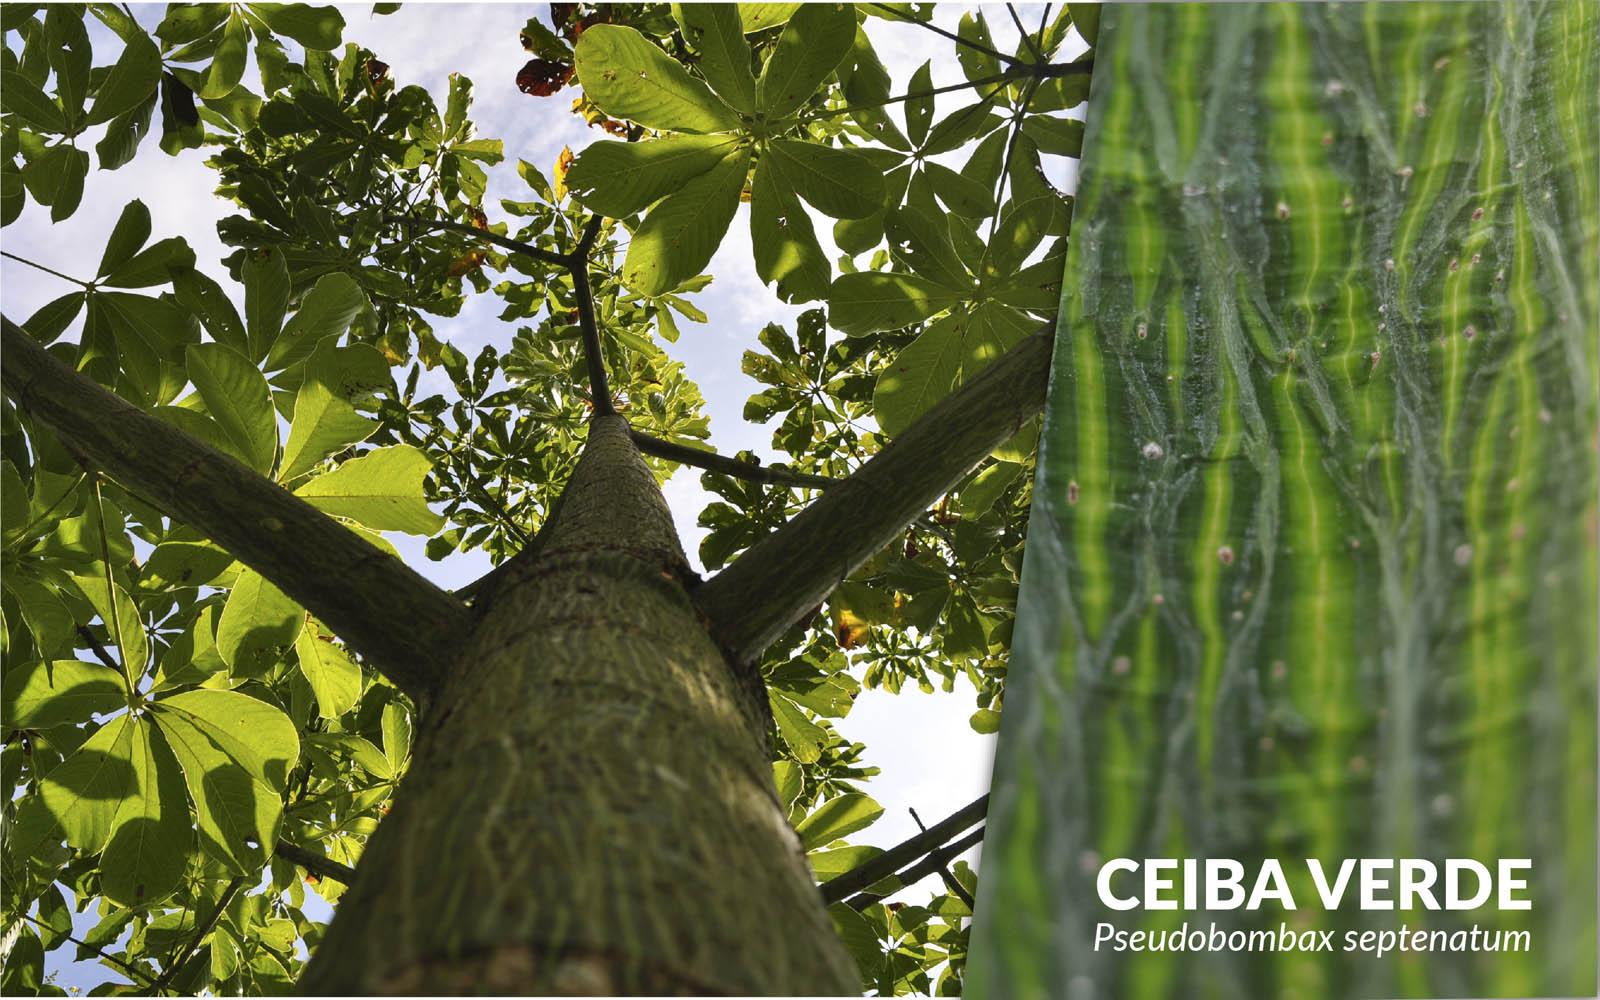 Ceiba verde